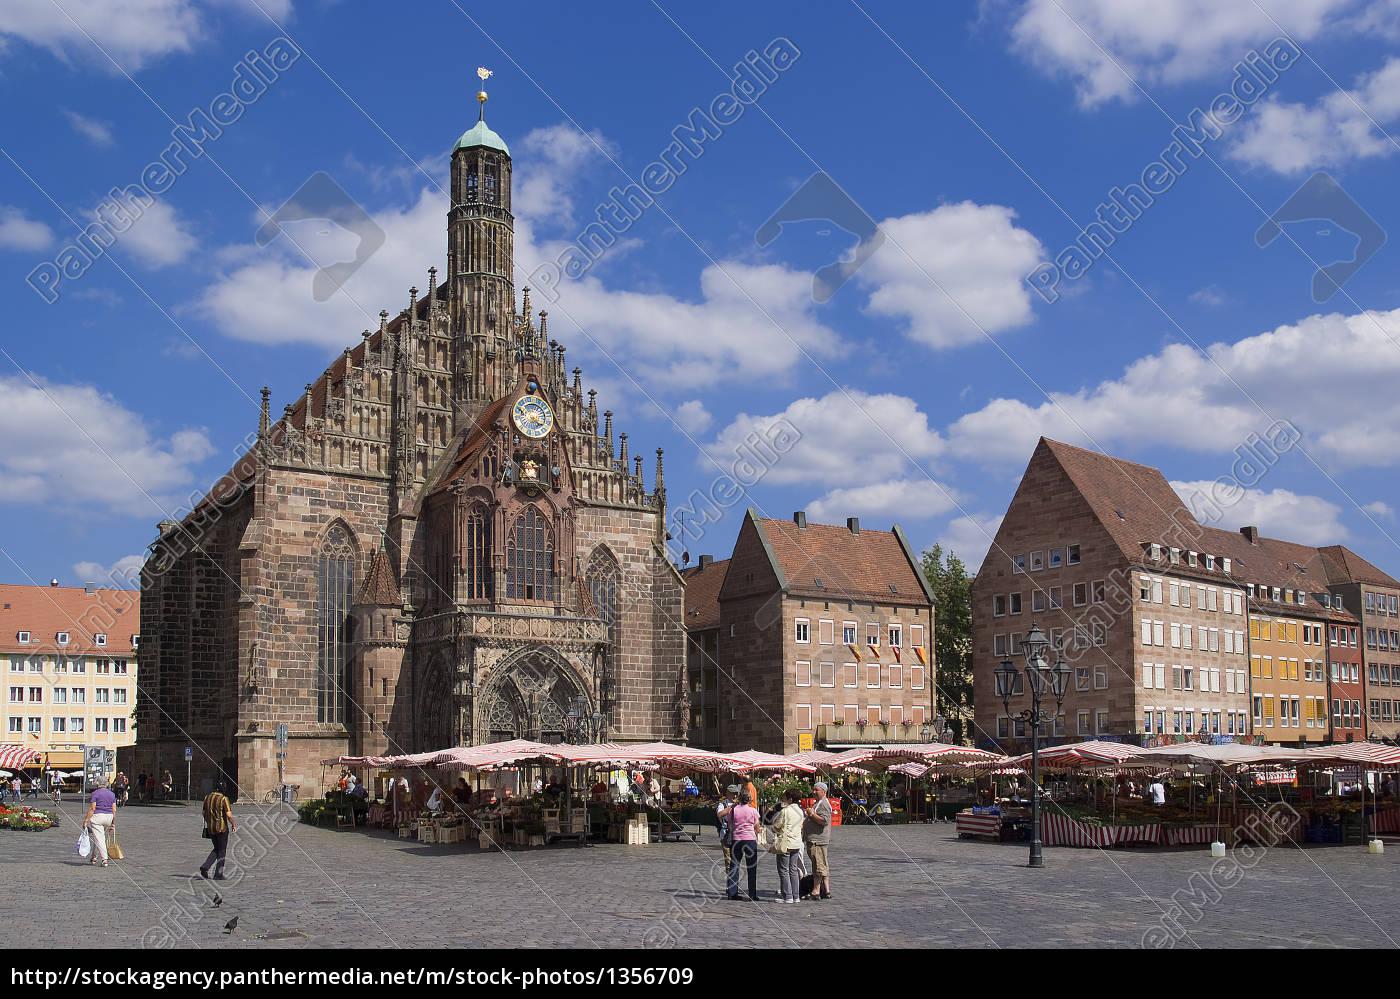 nuremberg, frauenkirche, on, the, main, market - 1356709